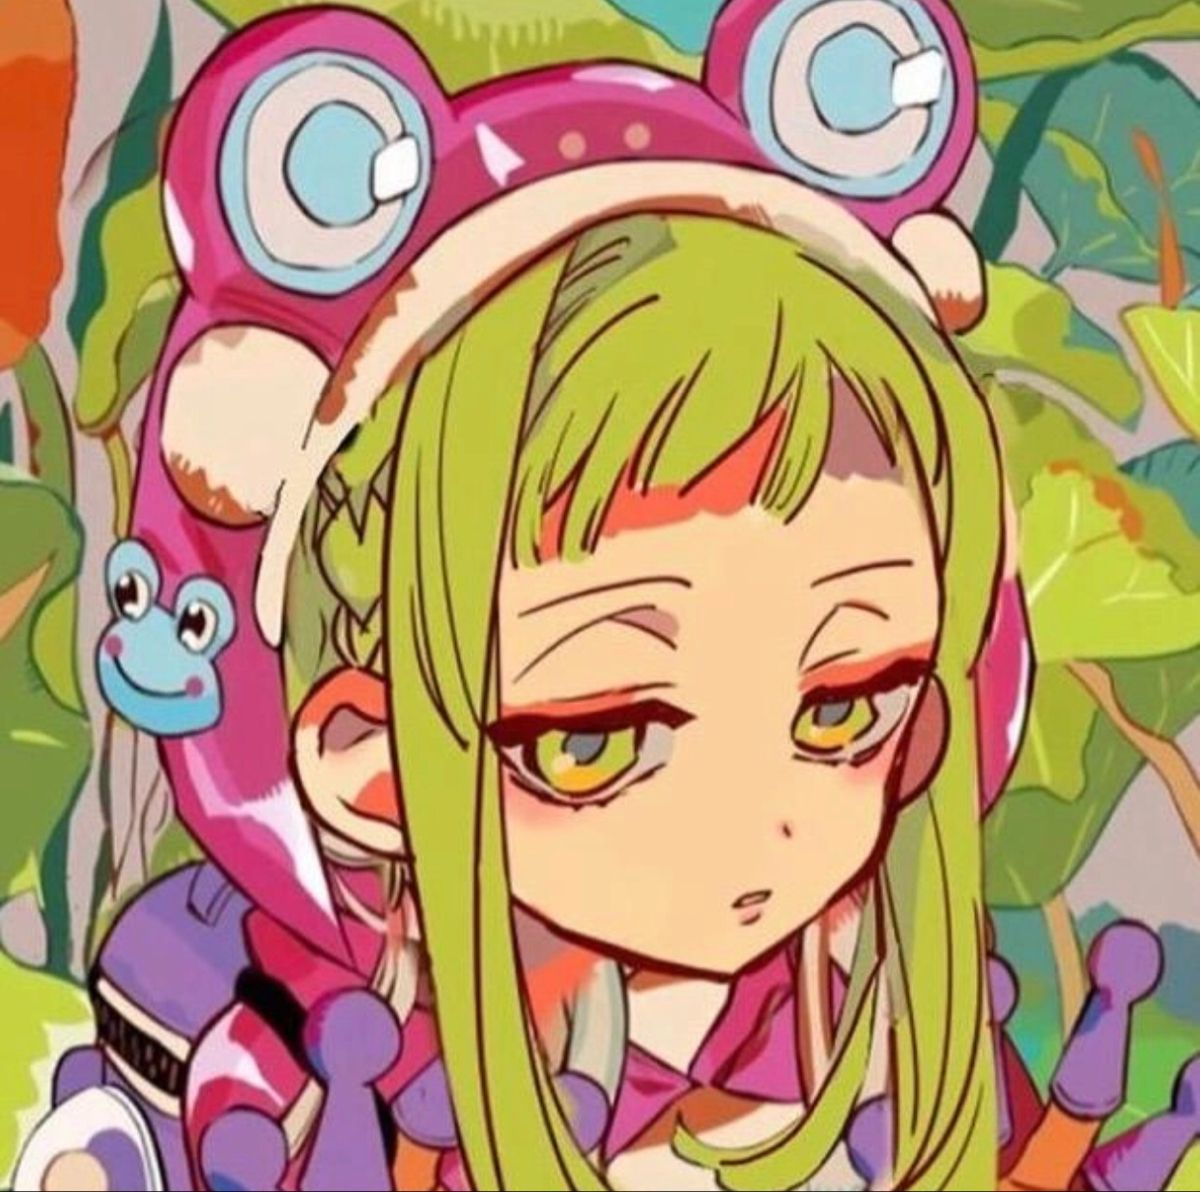 Walk away and cry where no one sees you. froggy sakura   Anime, Anime wallpaper live, Anime icons